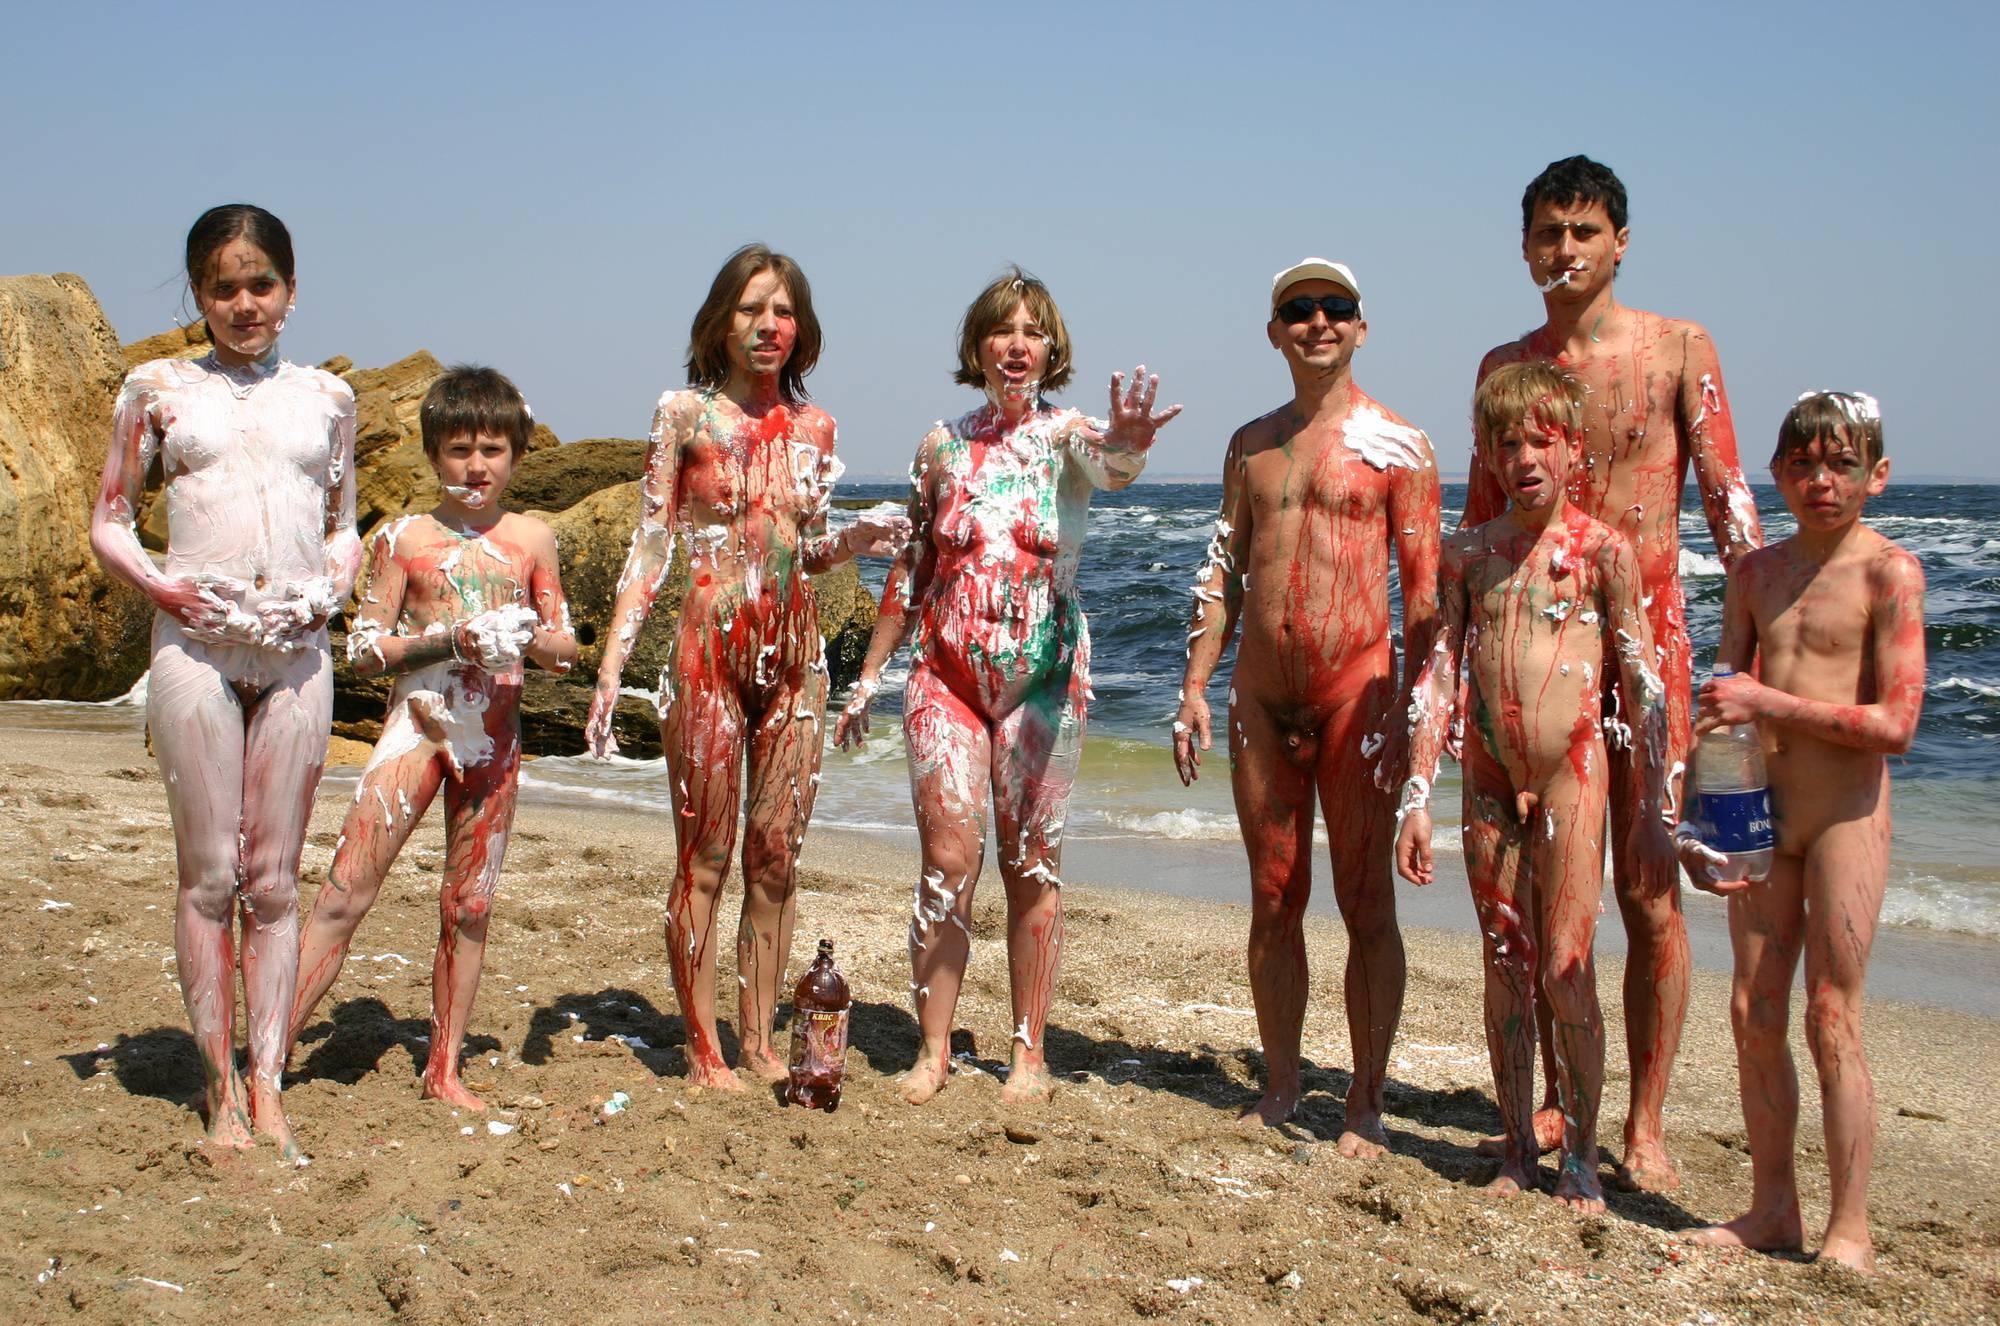 Nudist Pics Colors of Our Celebration - 2